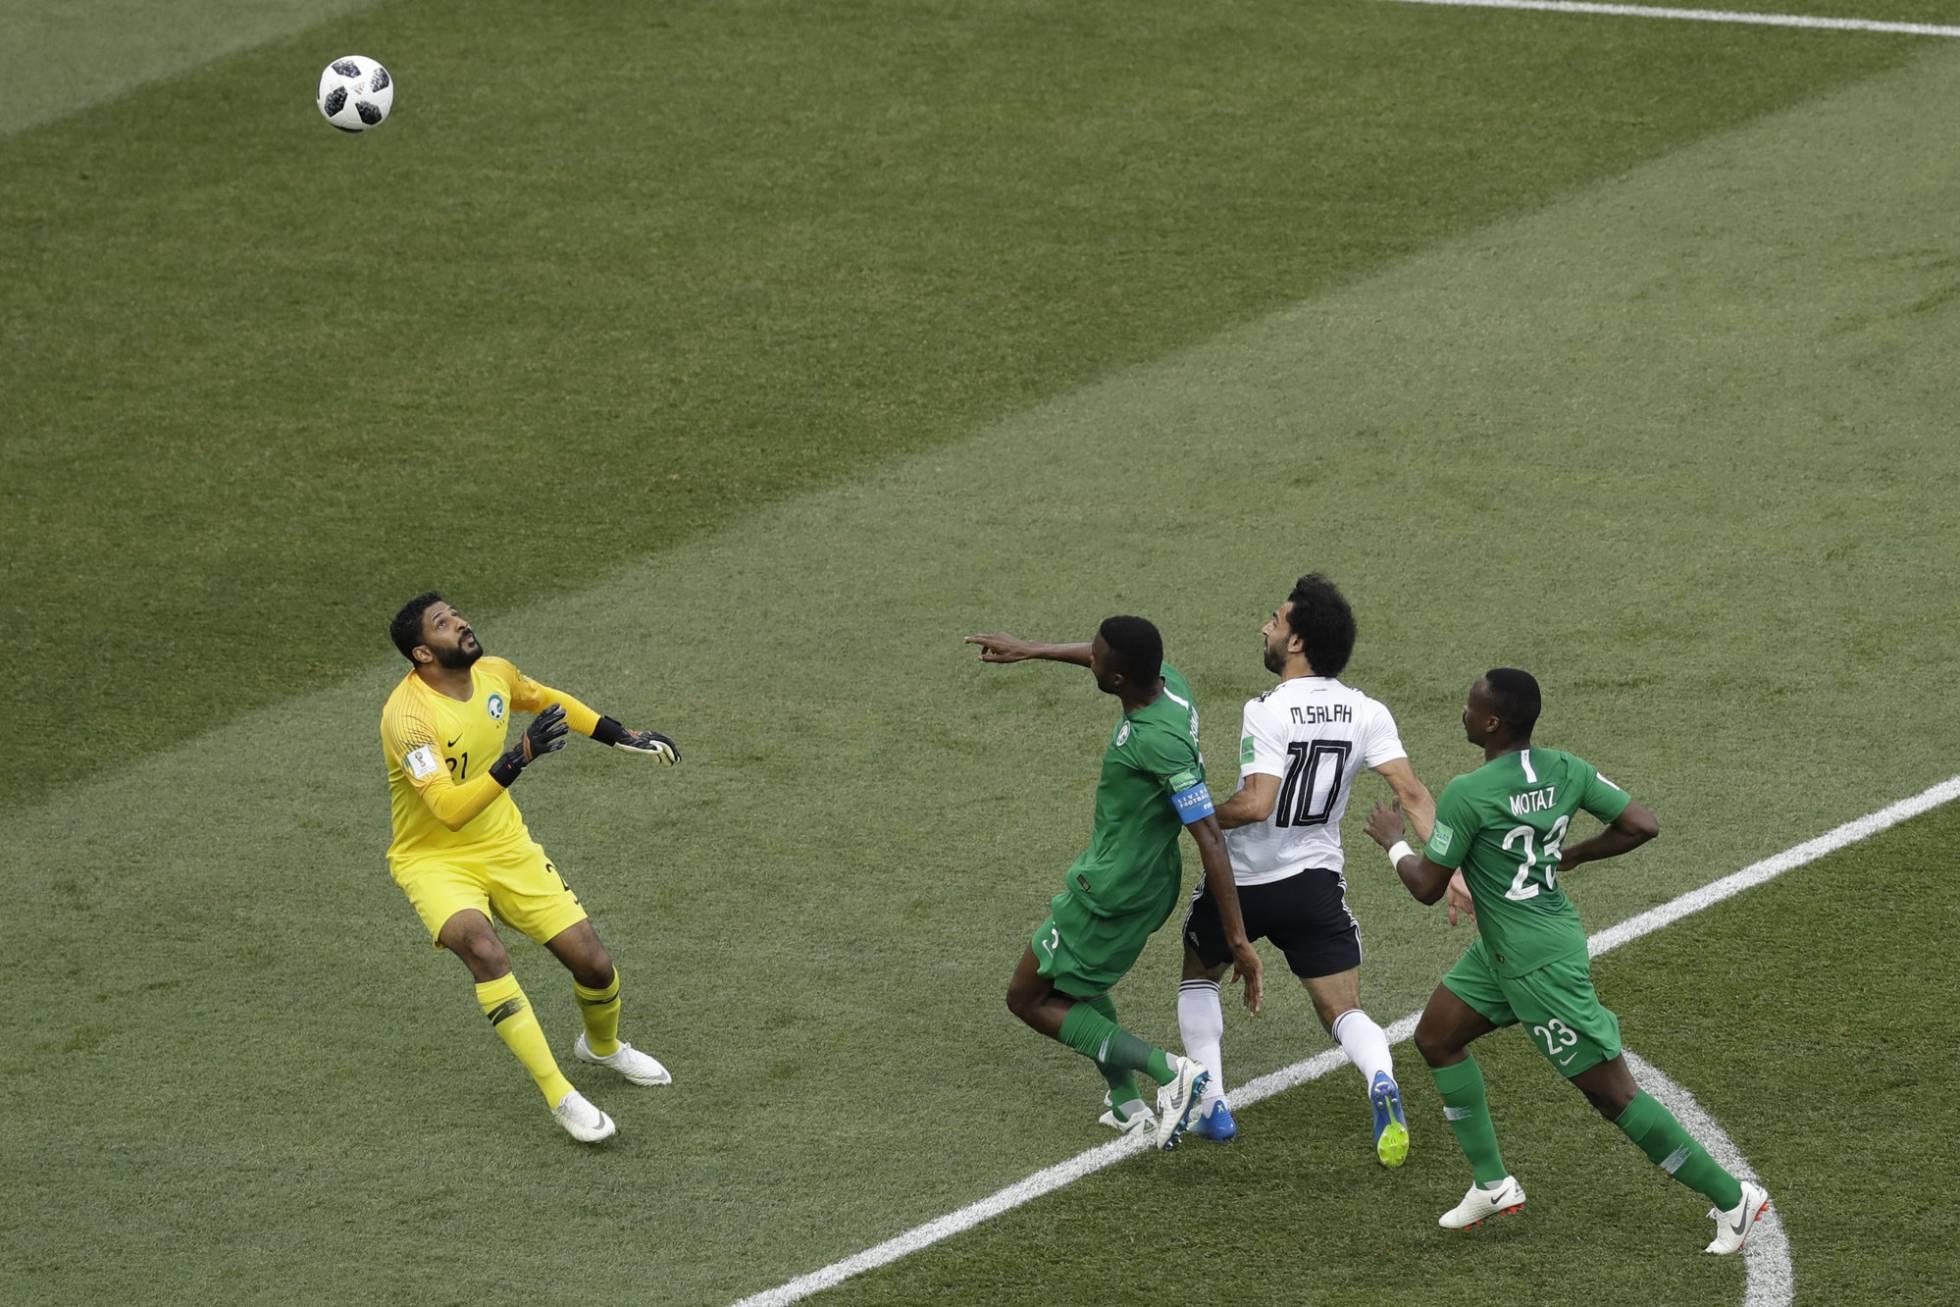 Mohamed Salah marca el gol de Egipto ante Arabia Saudí. THEMBA HADEBE AP